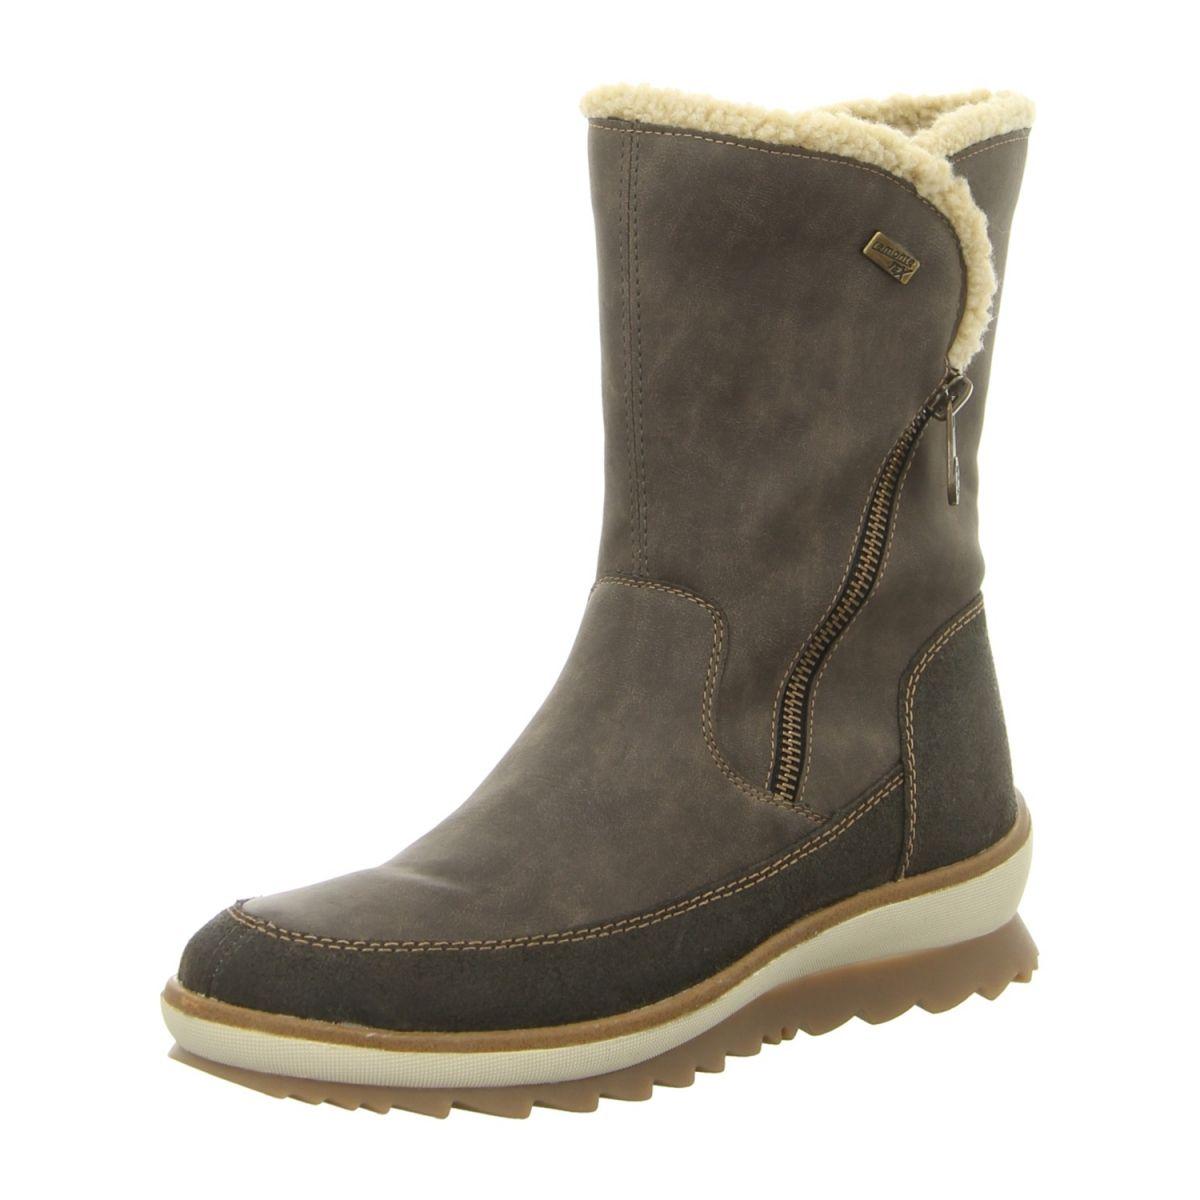 Remonte Schuhe Stiefelette R4374-45 grau kombi (grau) NEU